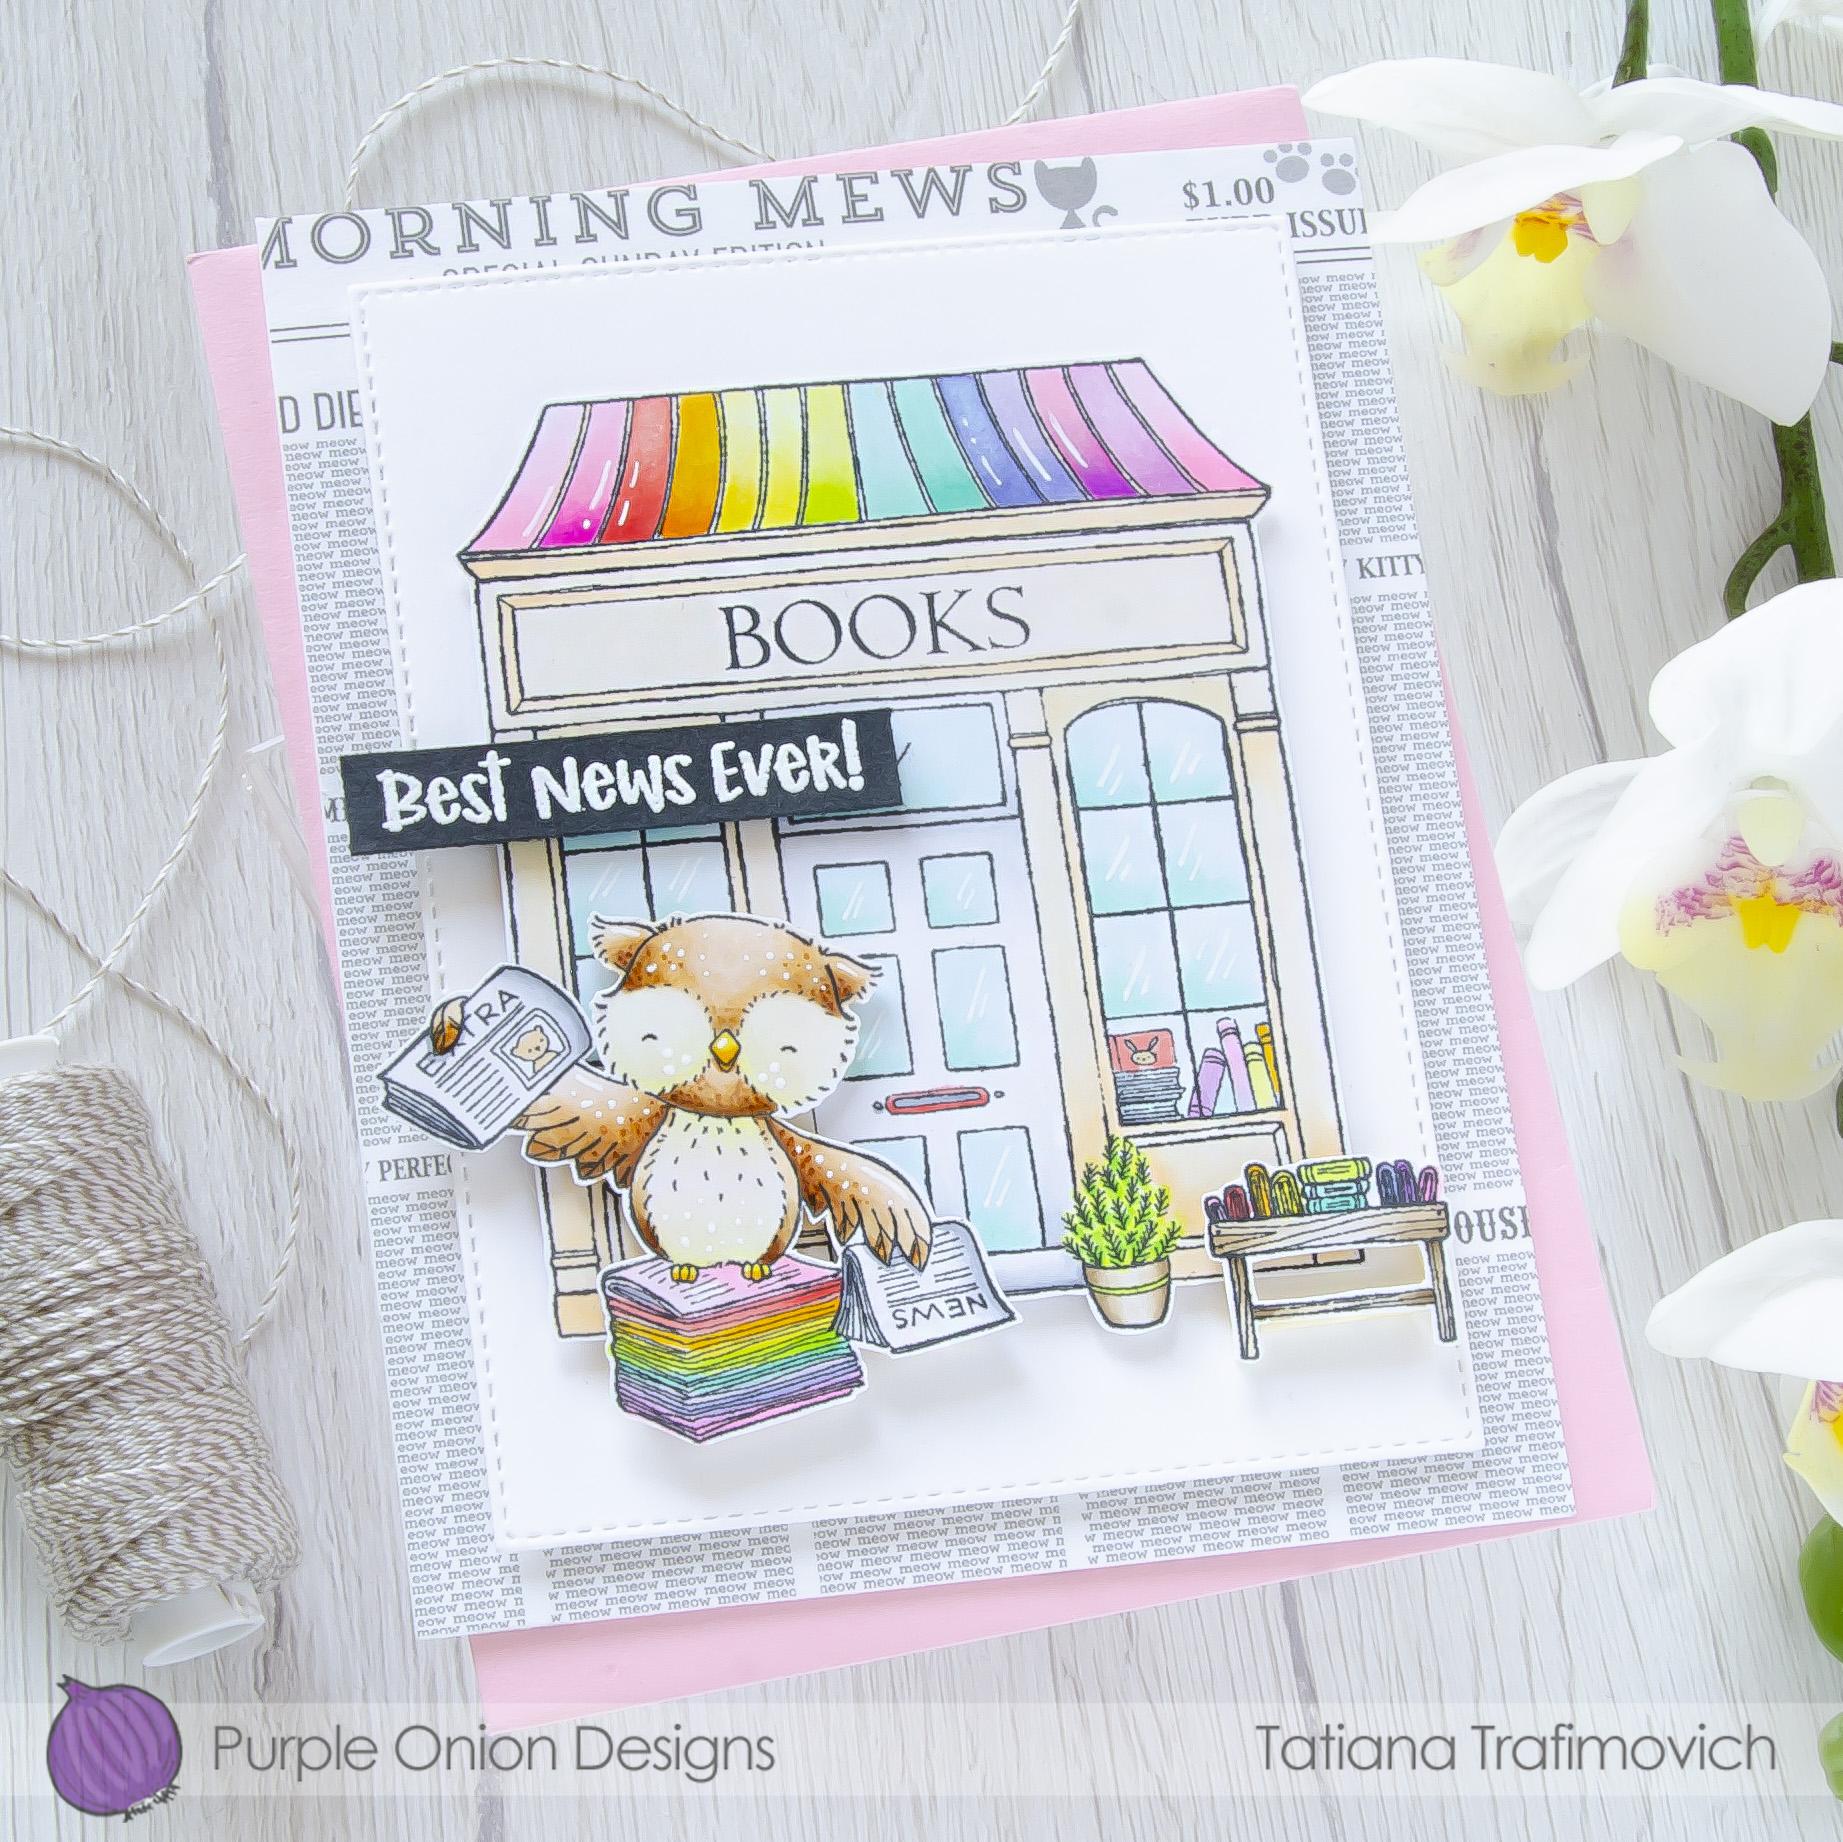 Best News Ever! #handmade card by Tatiana Trafimovich #tatianacraftandart - stamps by Purple Onion Designs